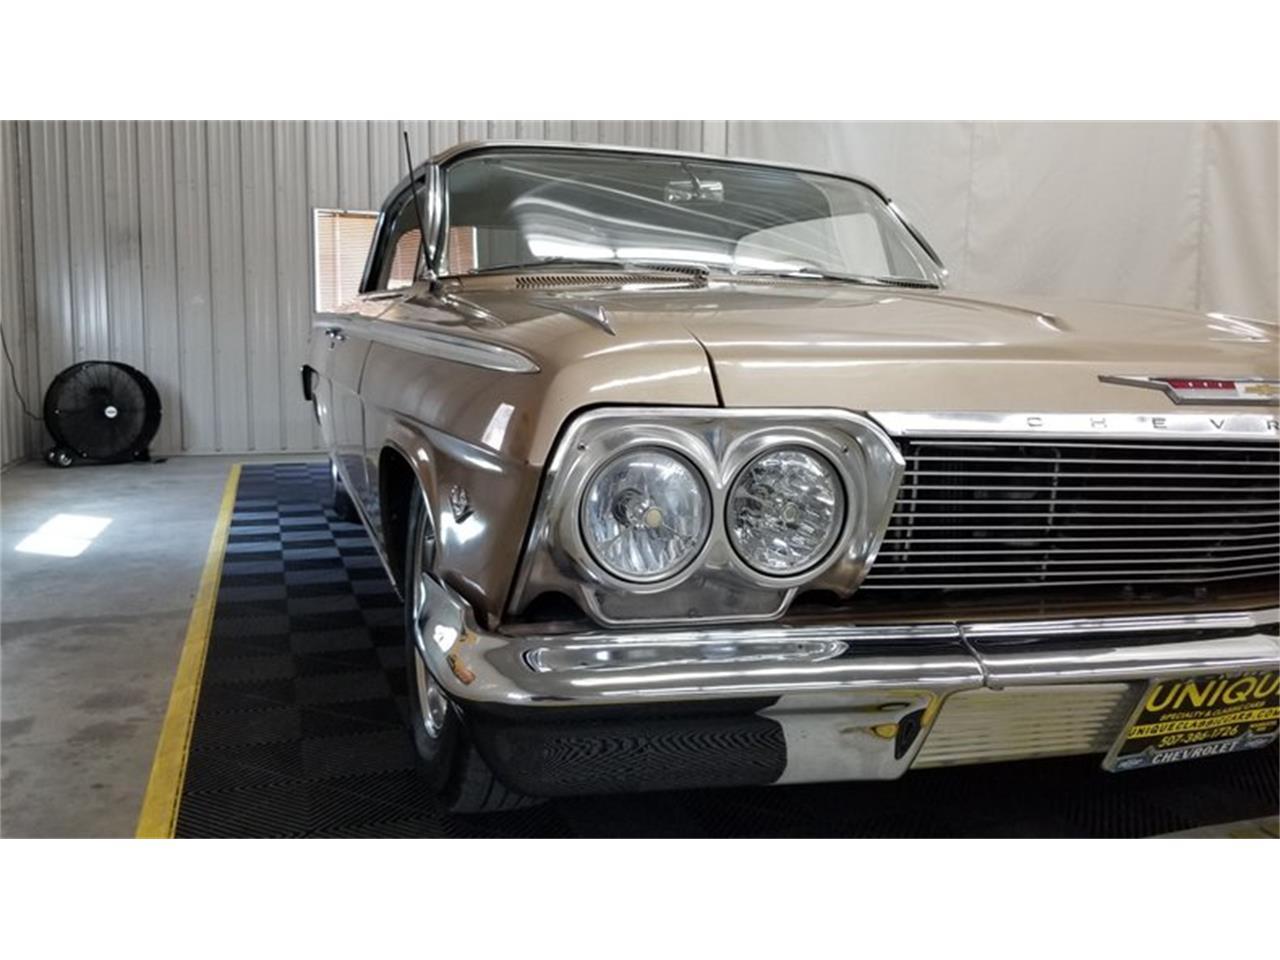 Large Picture of Classic 1962 Impala located in Minnesota - $29,900.00 - QKOQ